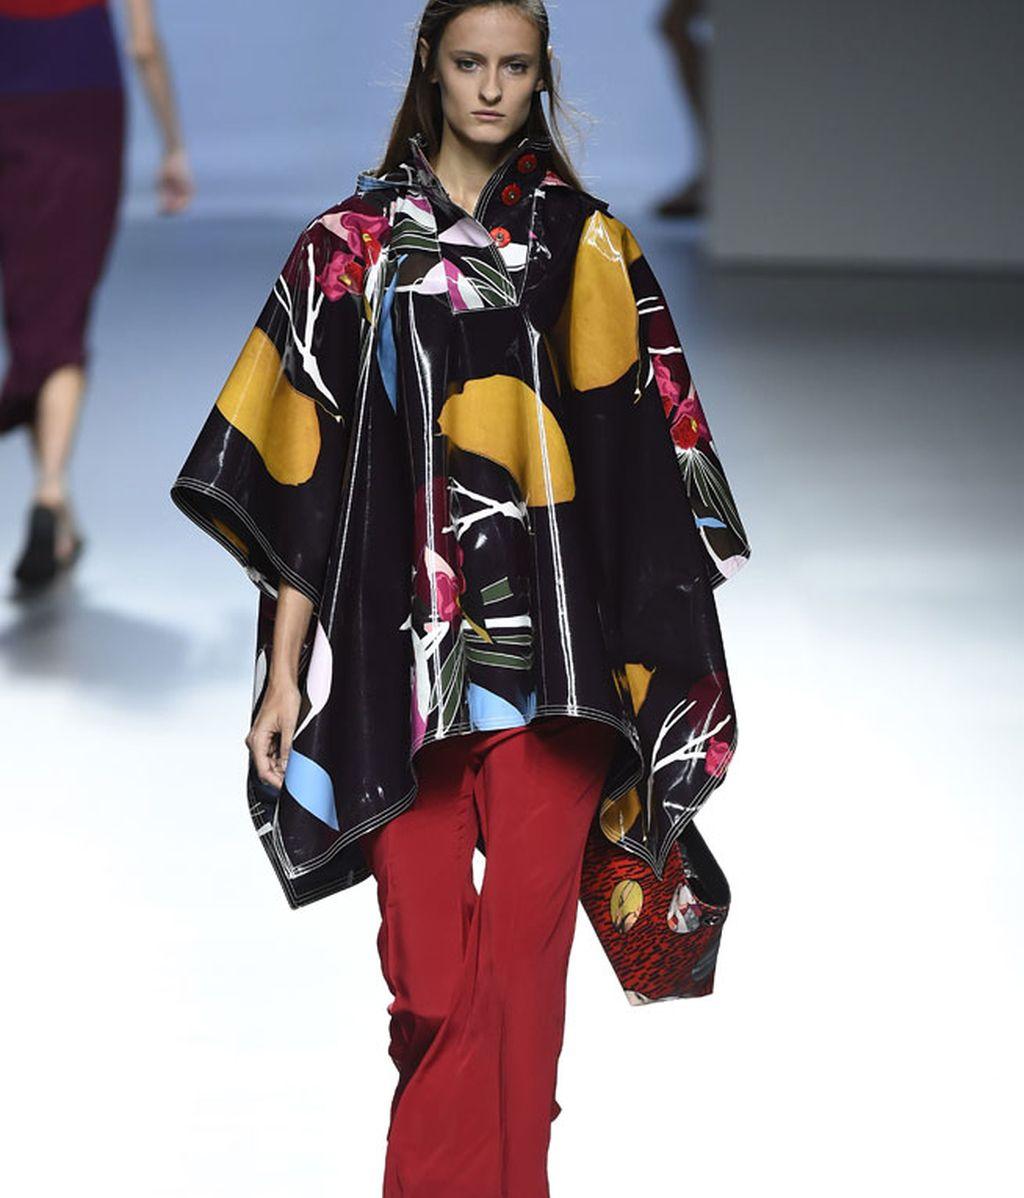 'Hiroko': la primera modelo asiática en la Alta Costura